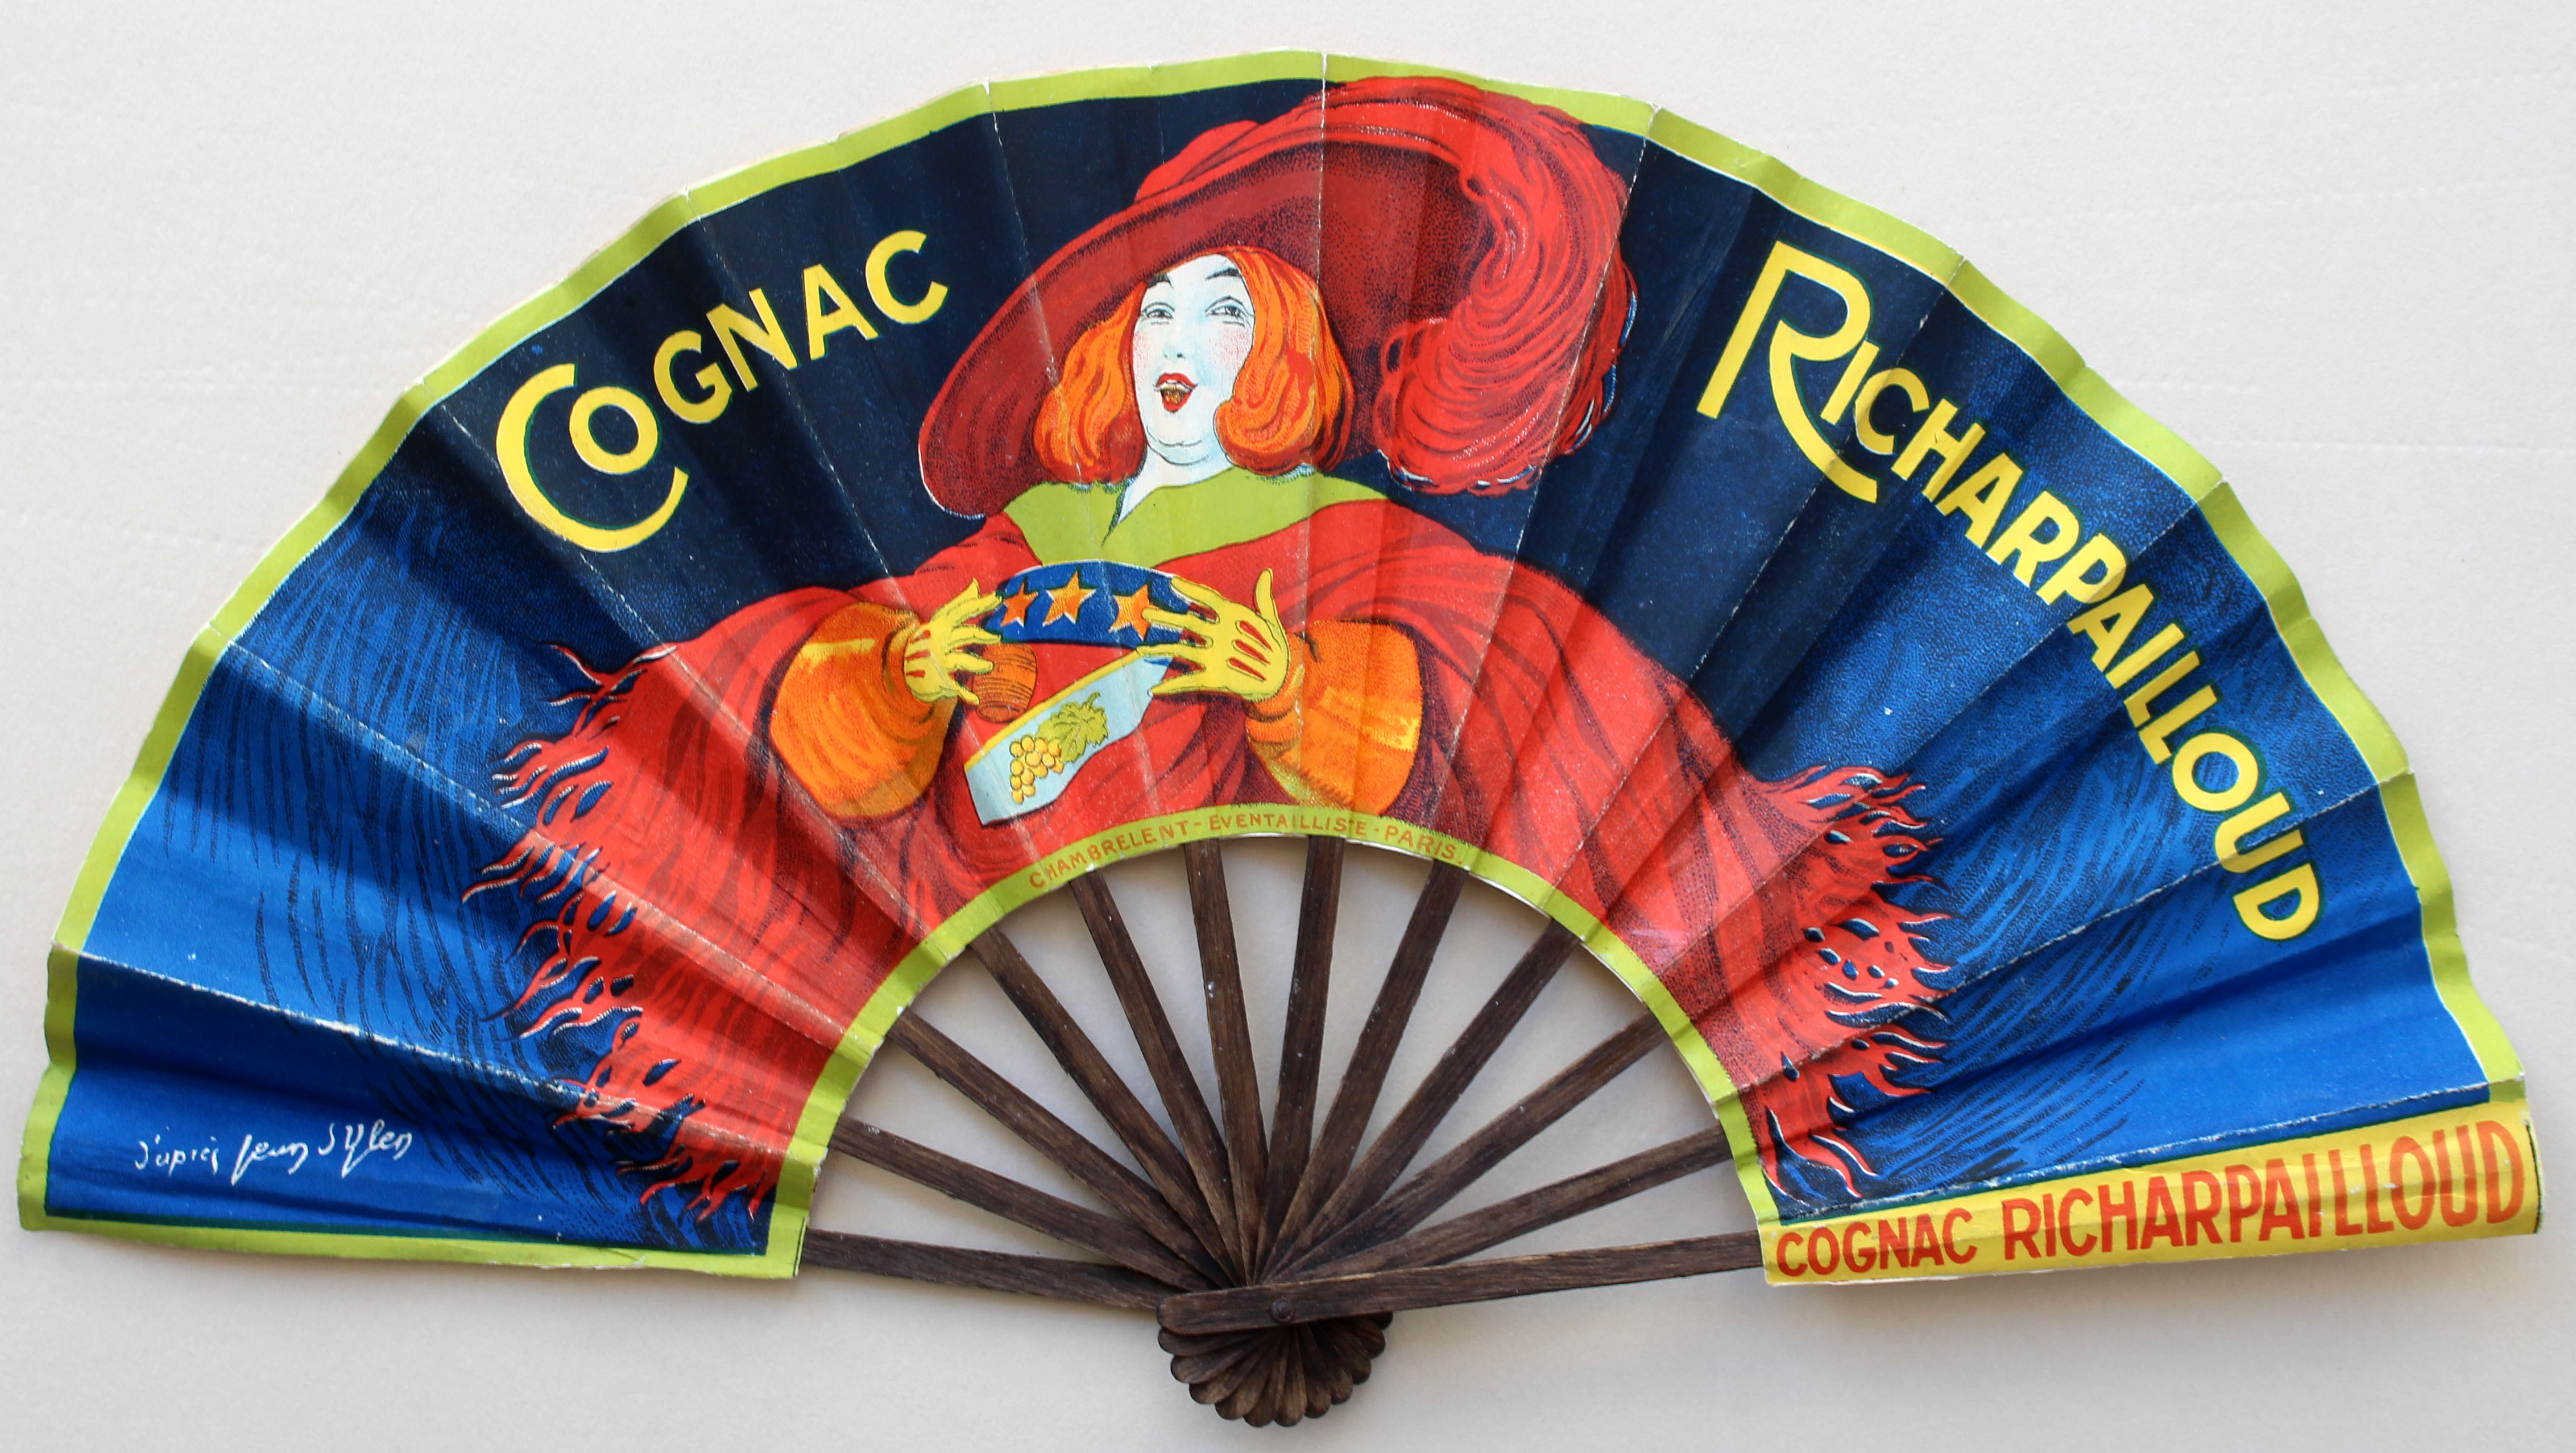 Lot 1207 - Advertising poster fan Cognac Richardpailloud